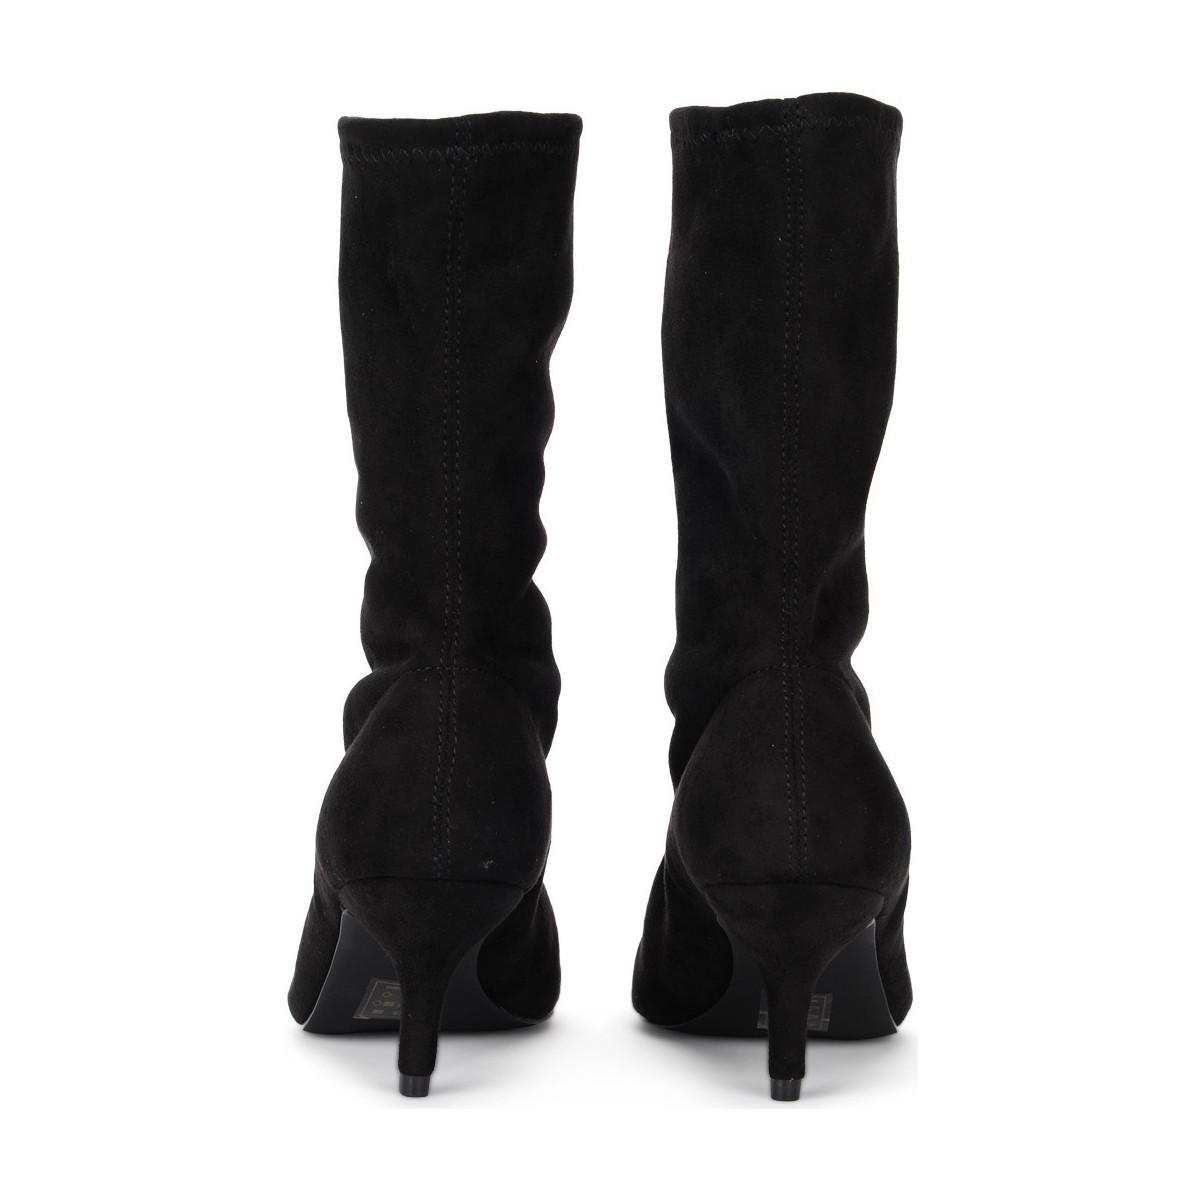 74c17deeb9c Steve Madden Ramone Black Elastic Suede Ankle Boots Women s Low ...